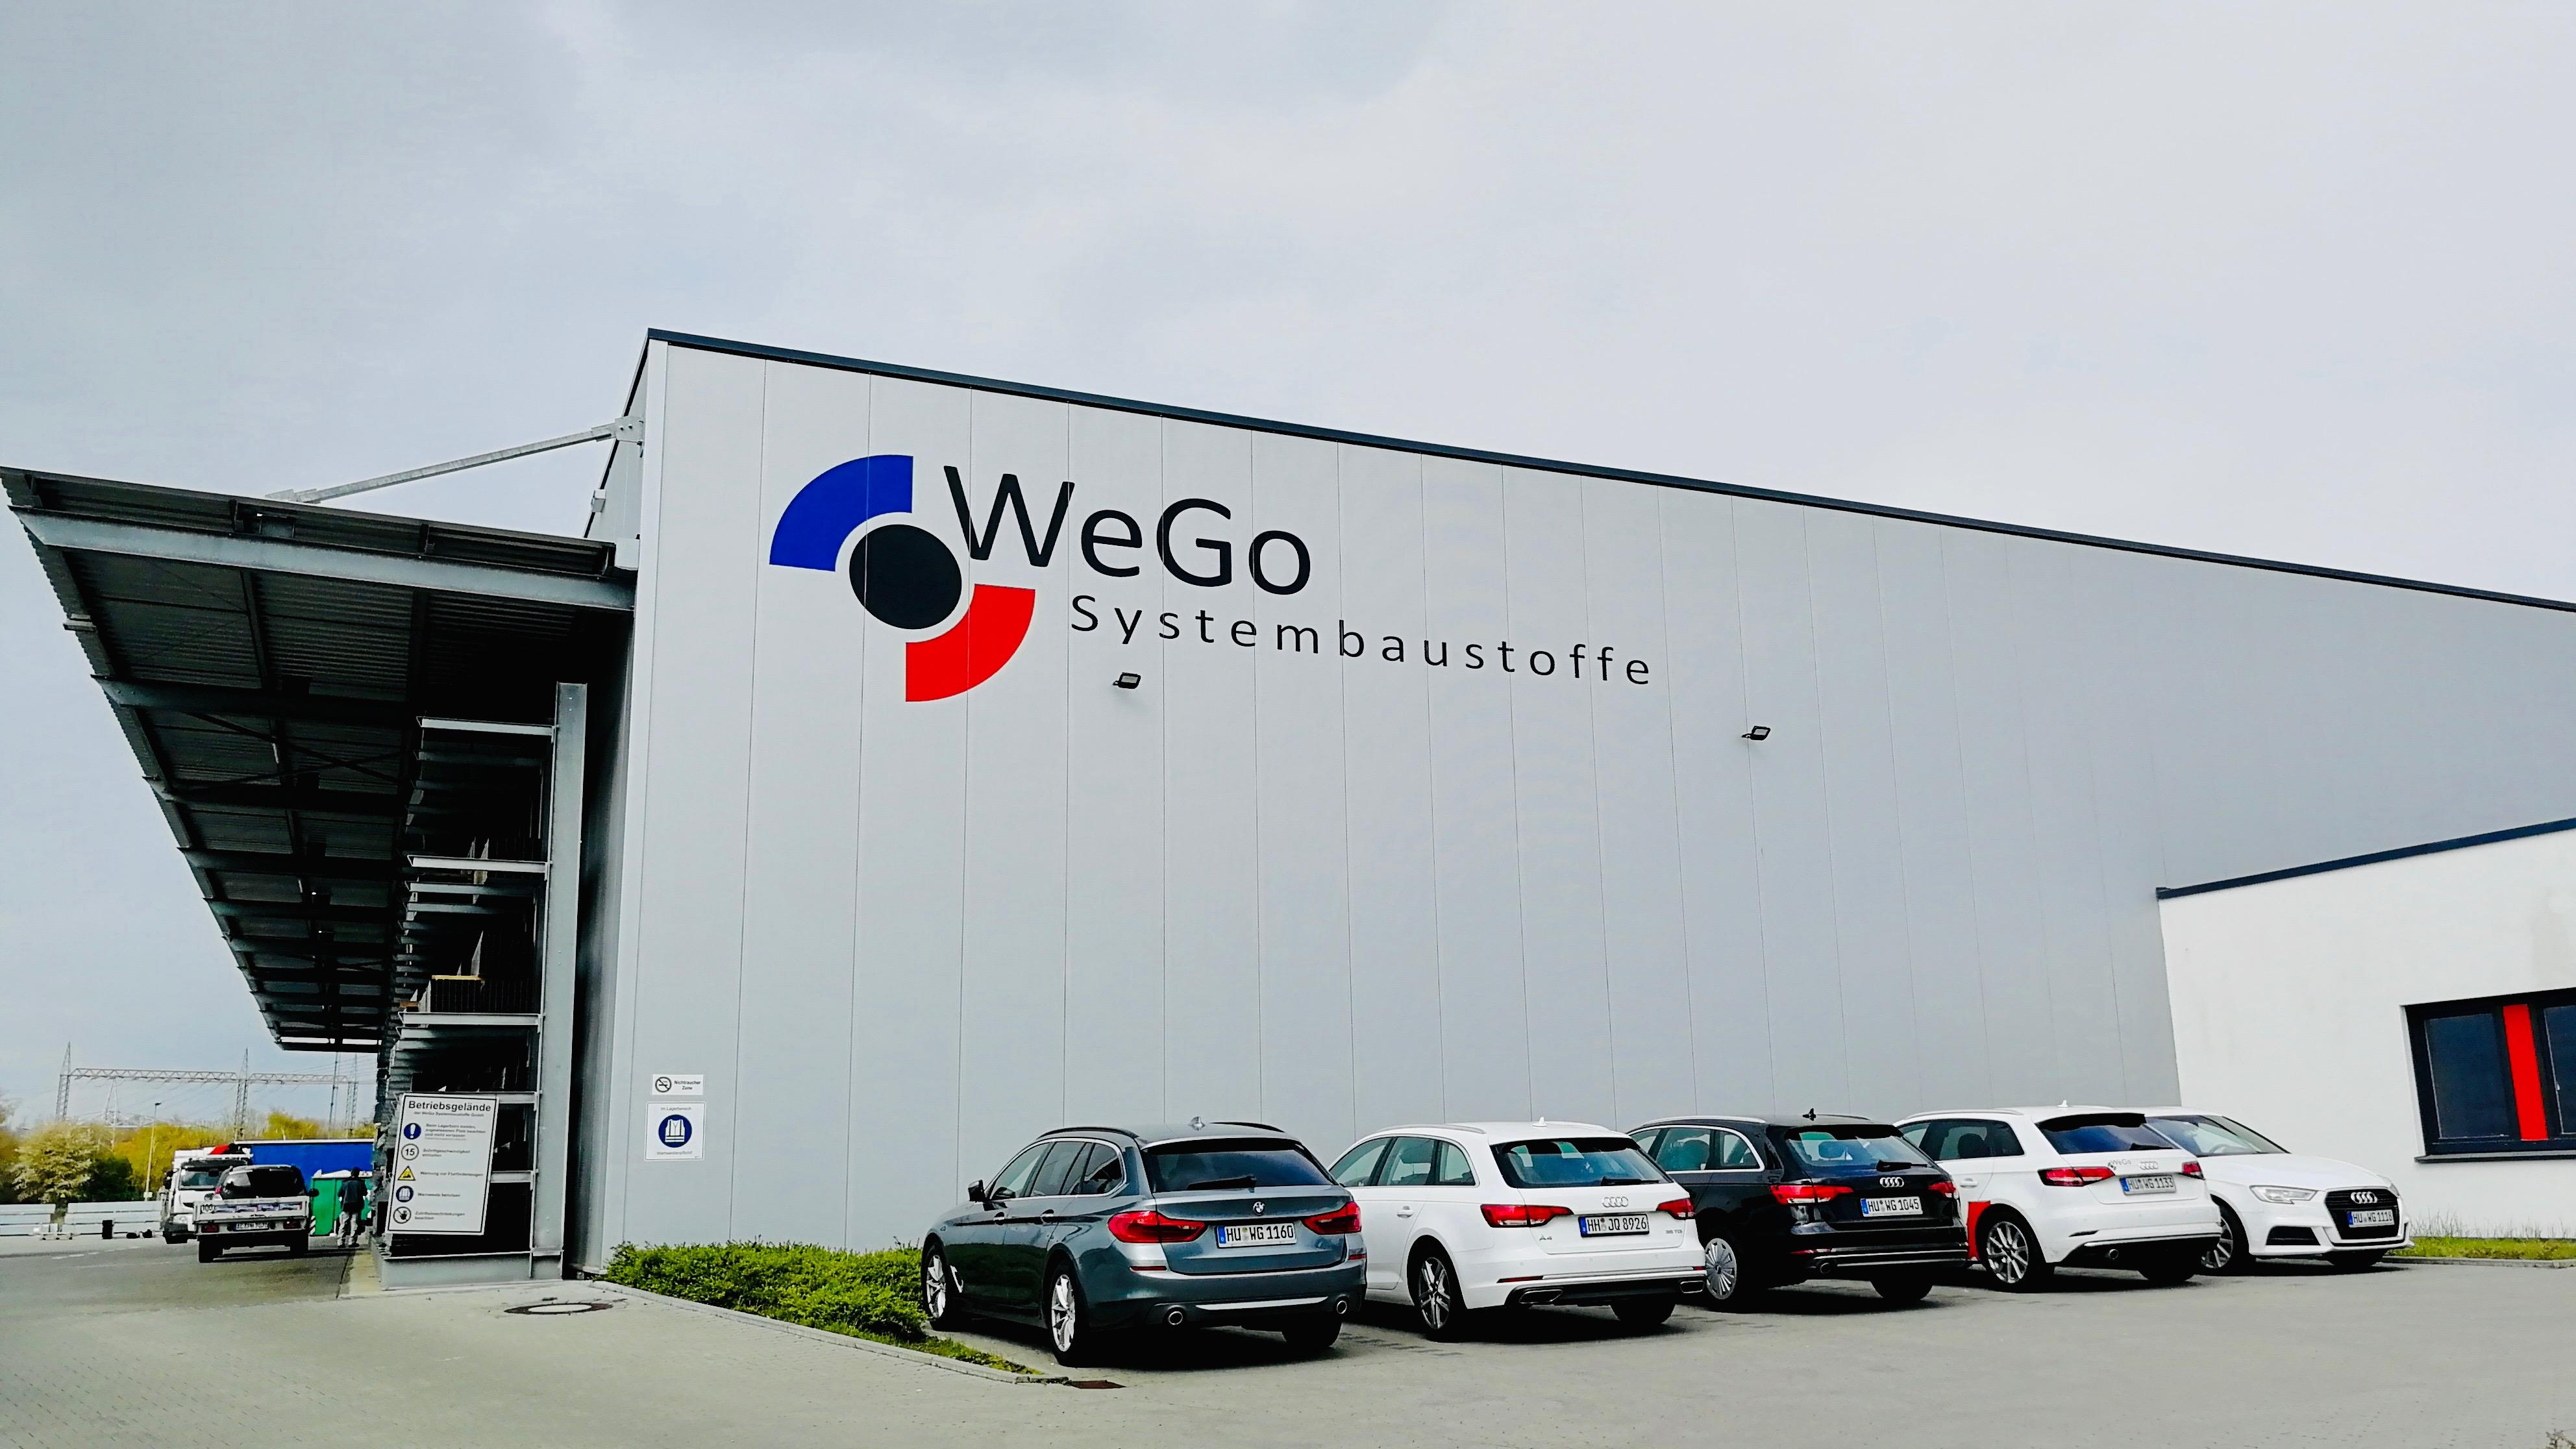 Wego/Vti Eschweiler